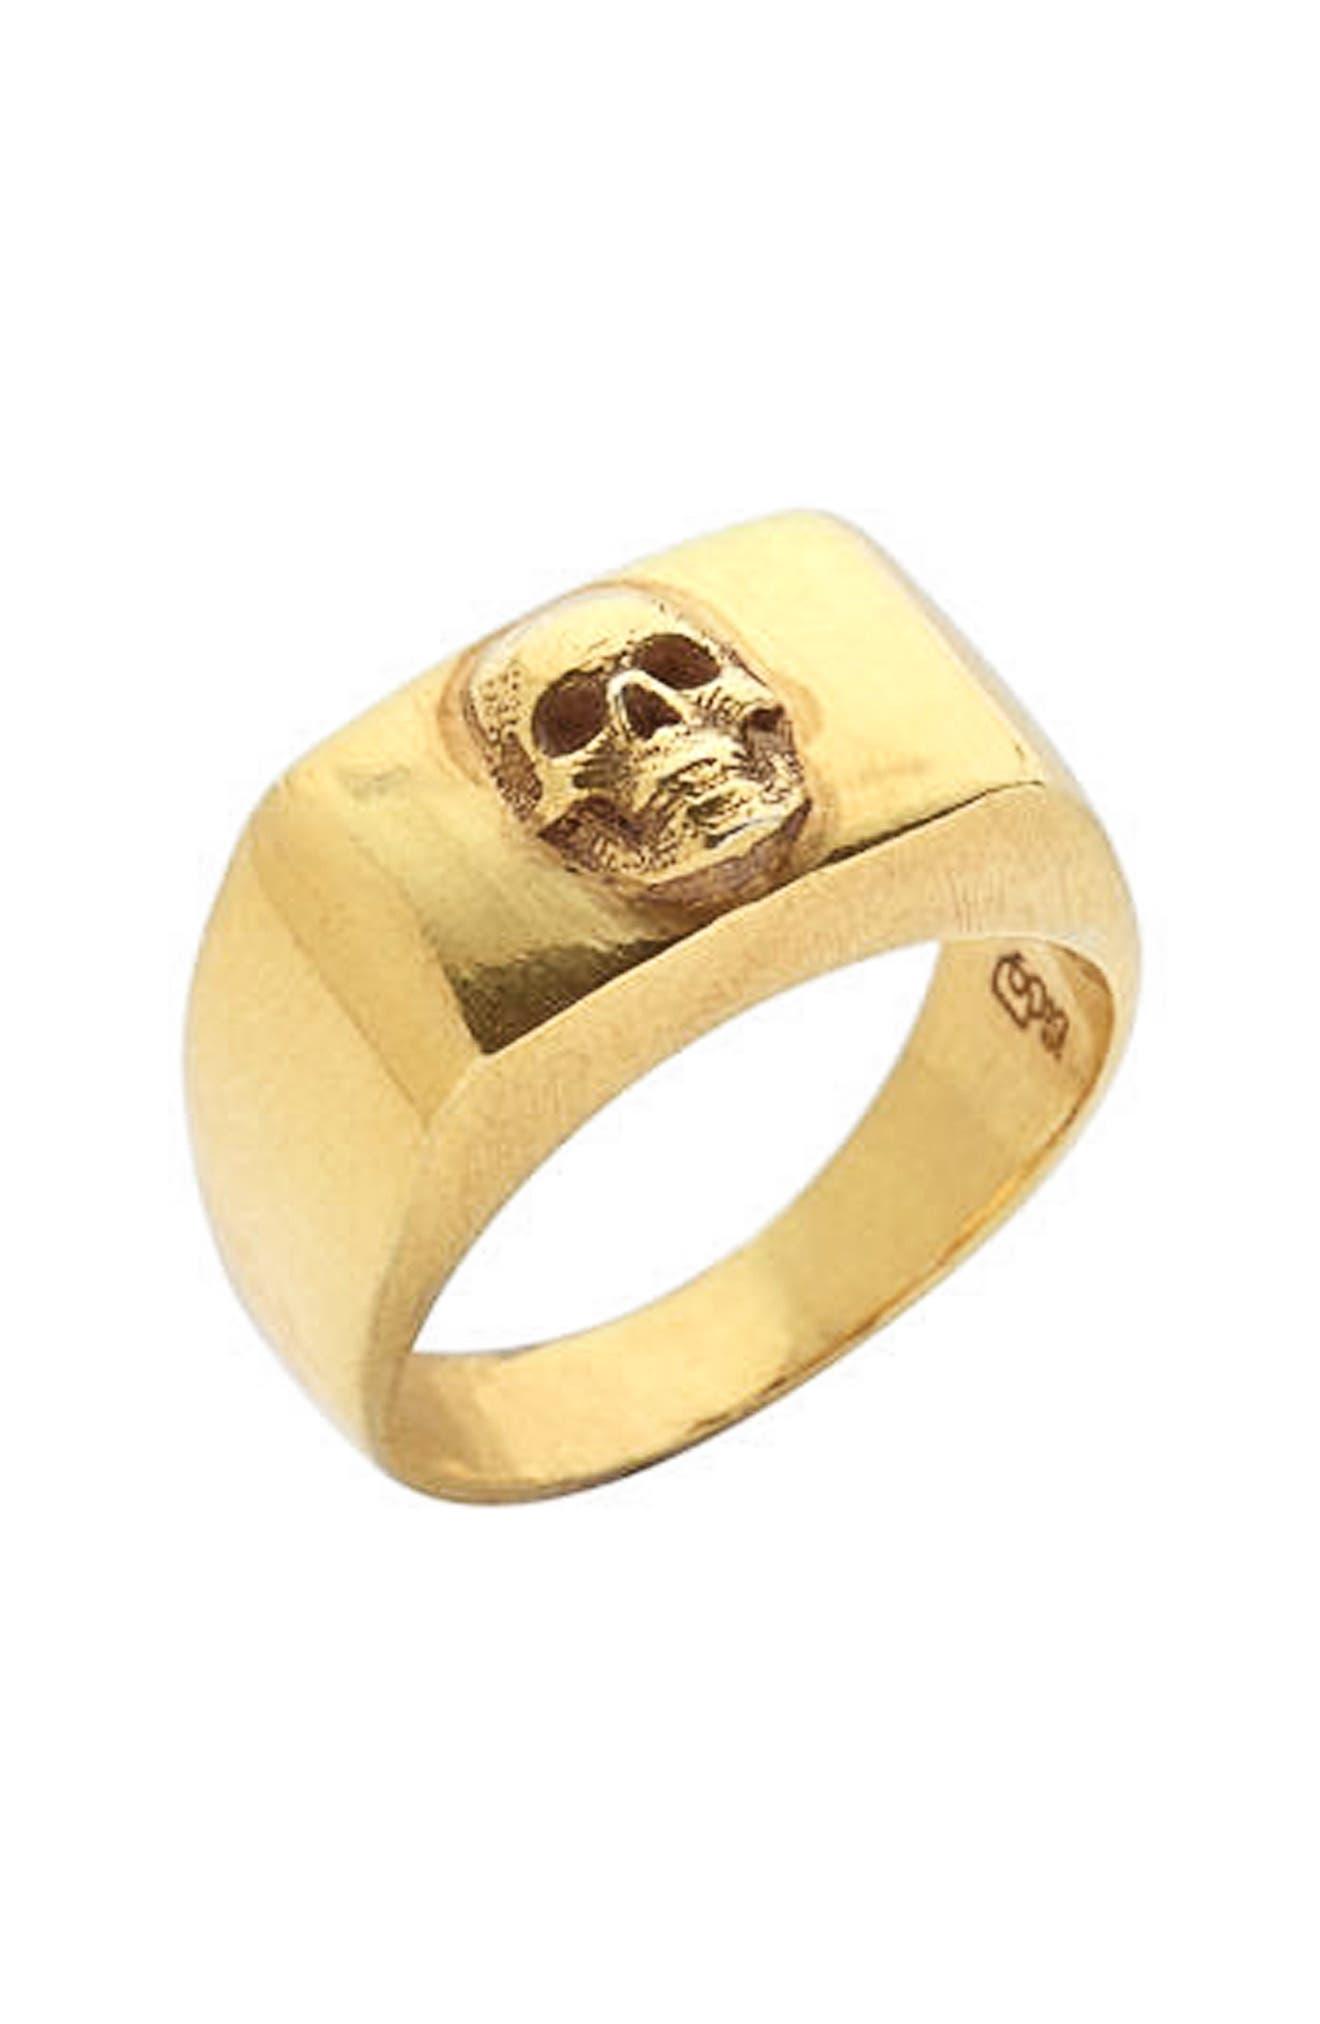 Degs & Sal Skull Ring